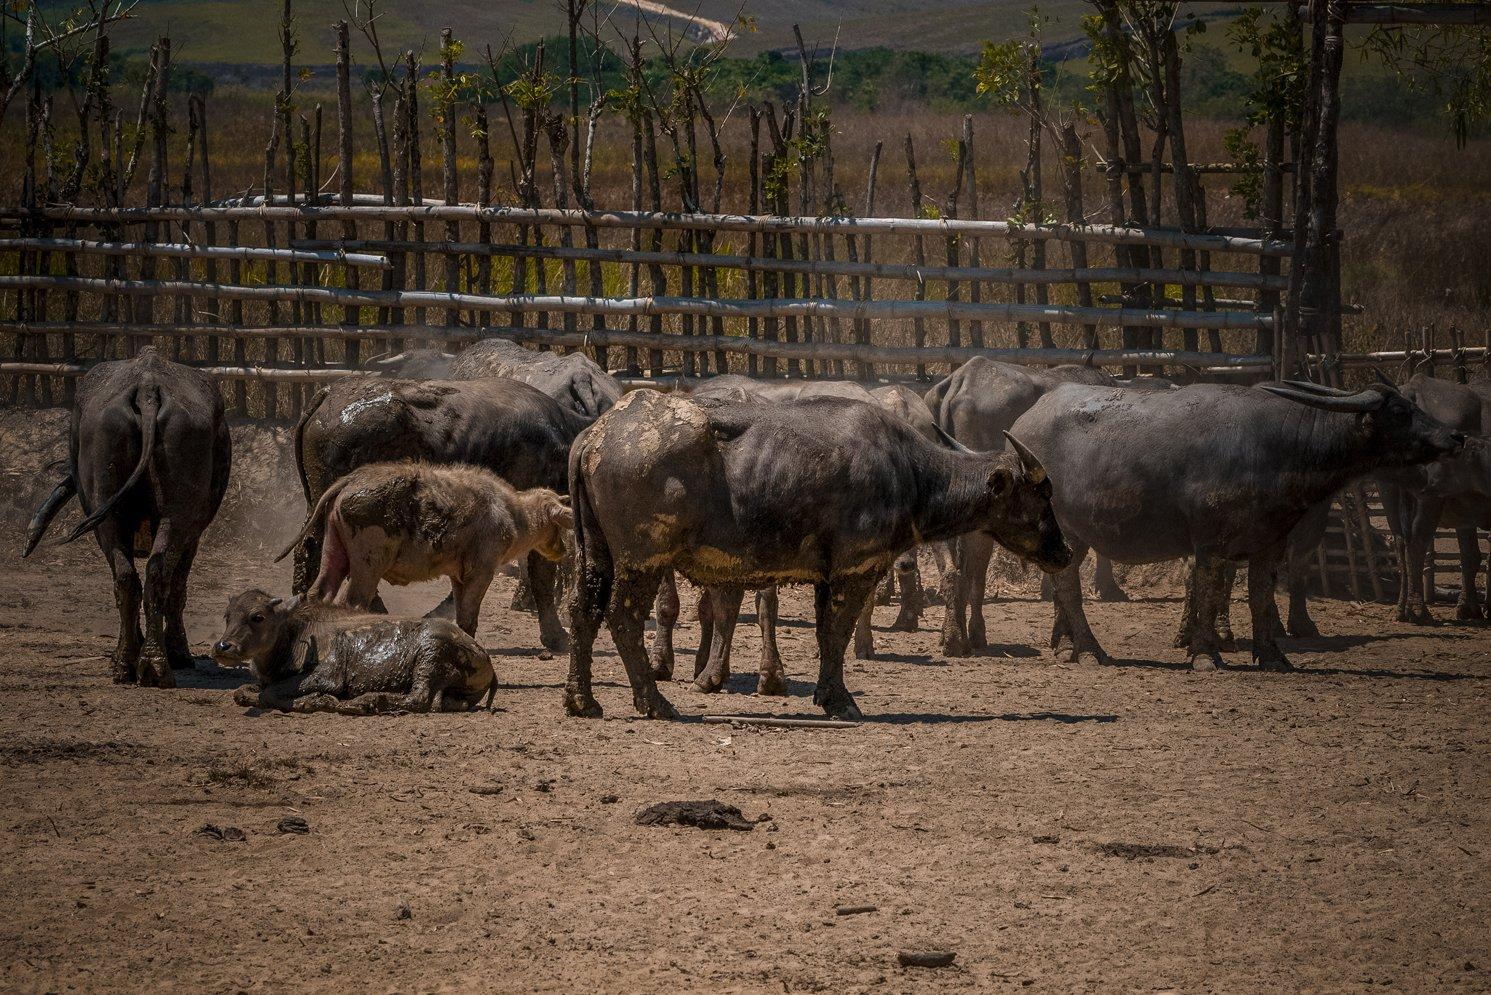 Persoalan bibit atau anakan kerbau dan sapi sering menjadi ganjalan utama. Angka fertilitas atau kelahiran hewan ternak di peternakan itu terbilang sangat rendah.